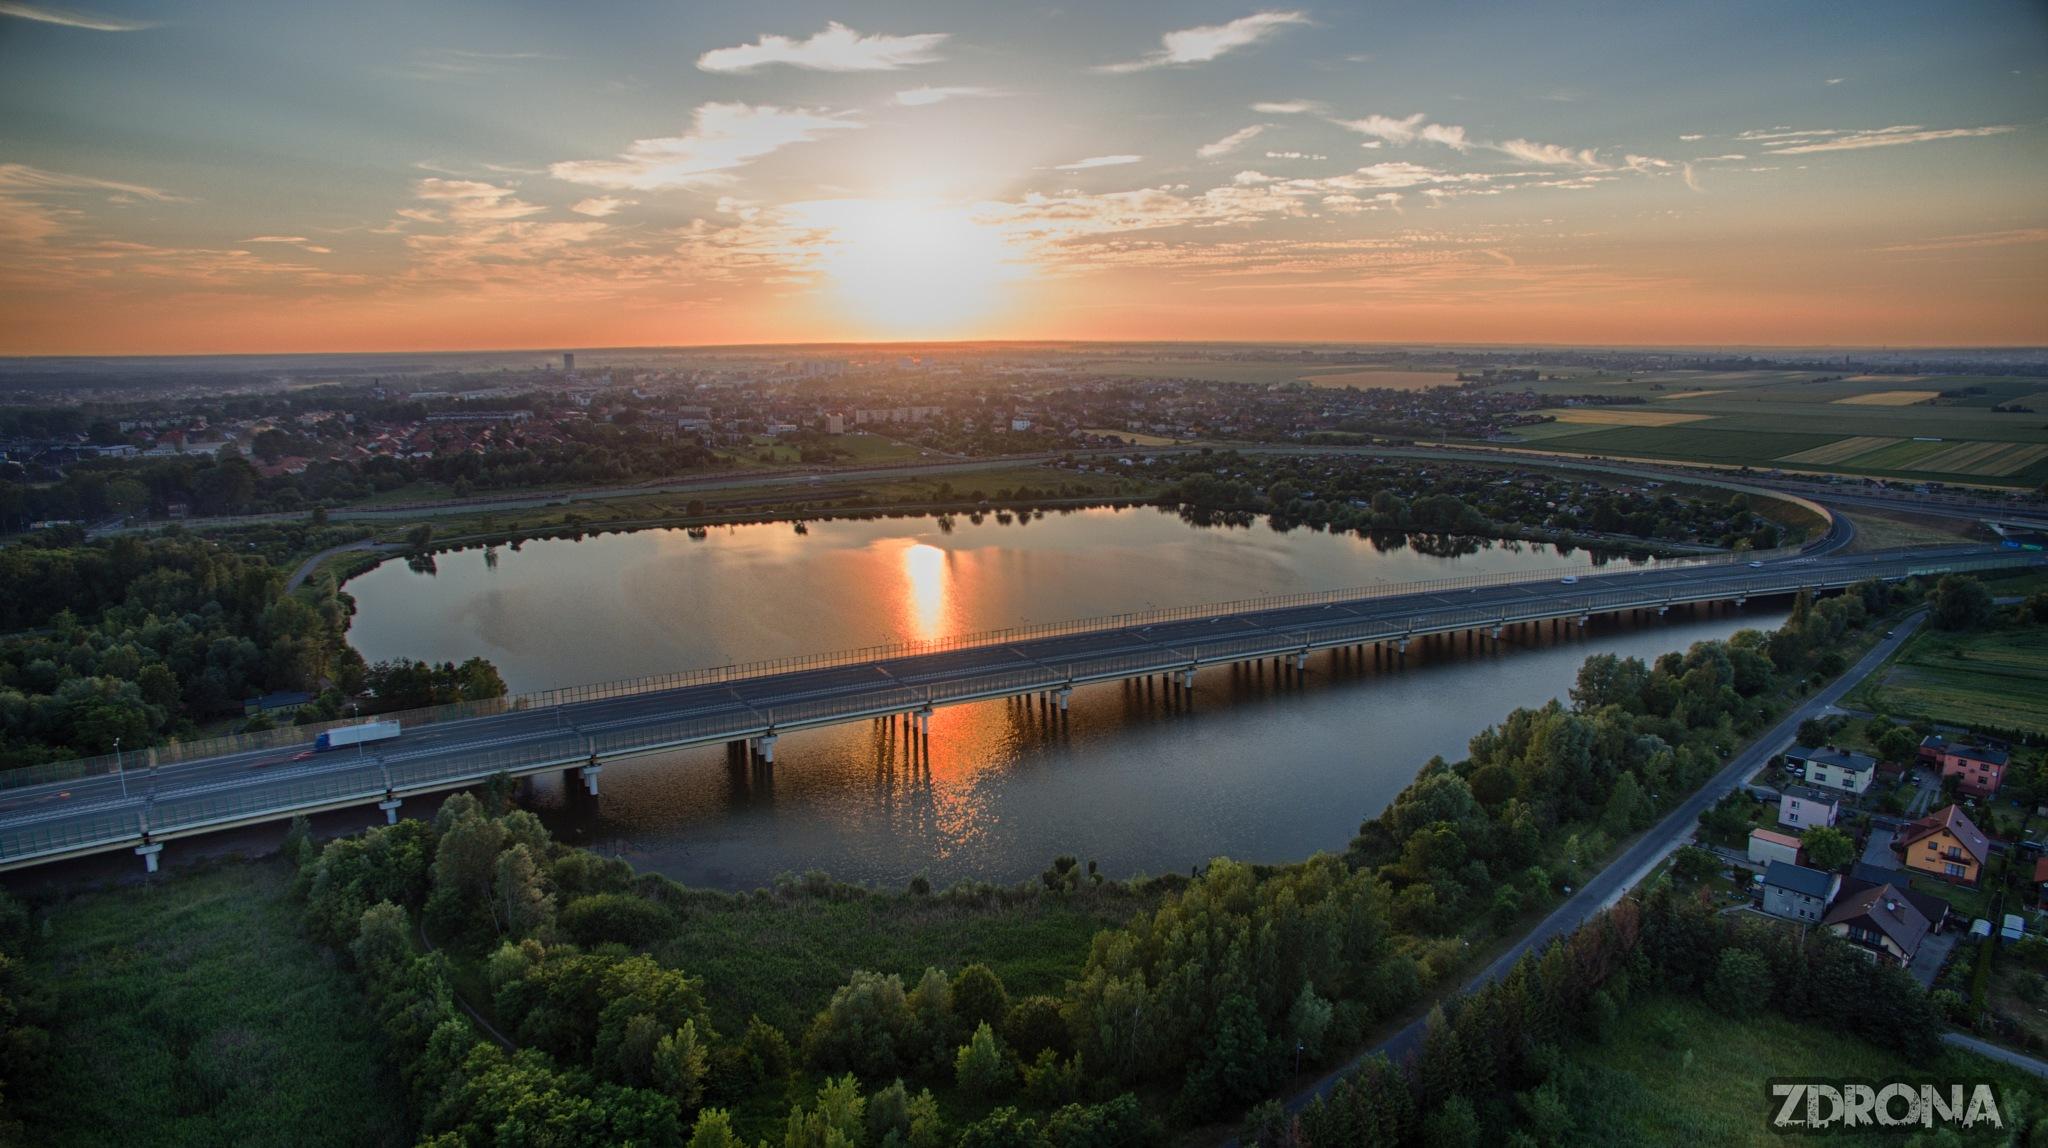 Sunset Lake by Rafal Grzegorz